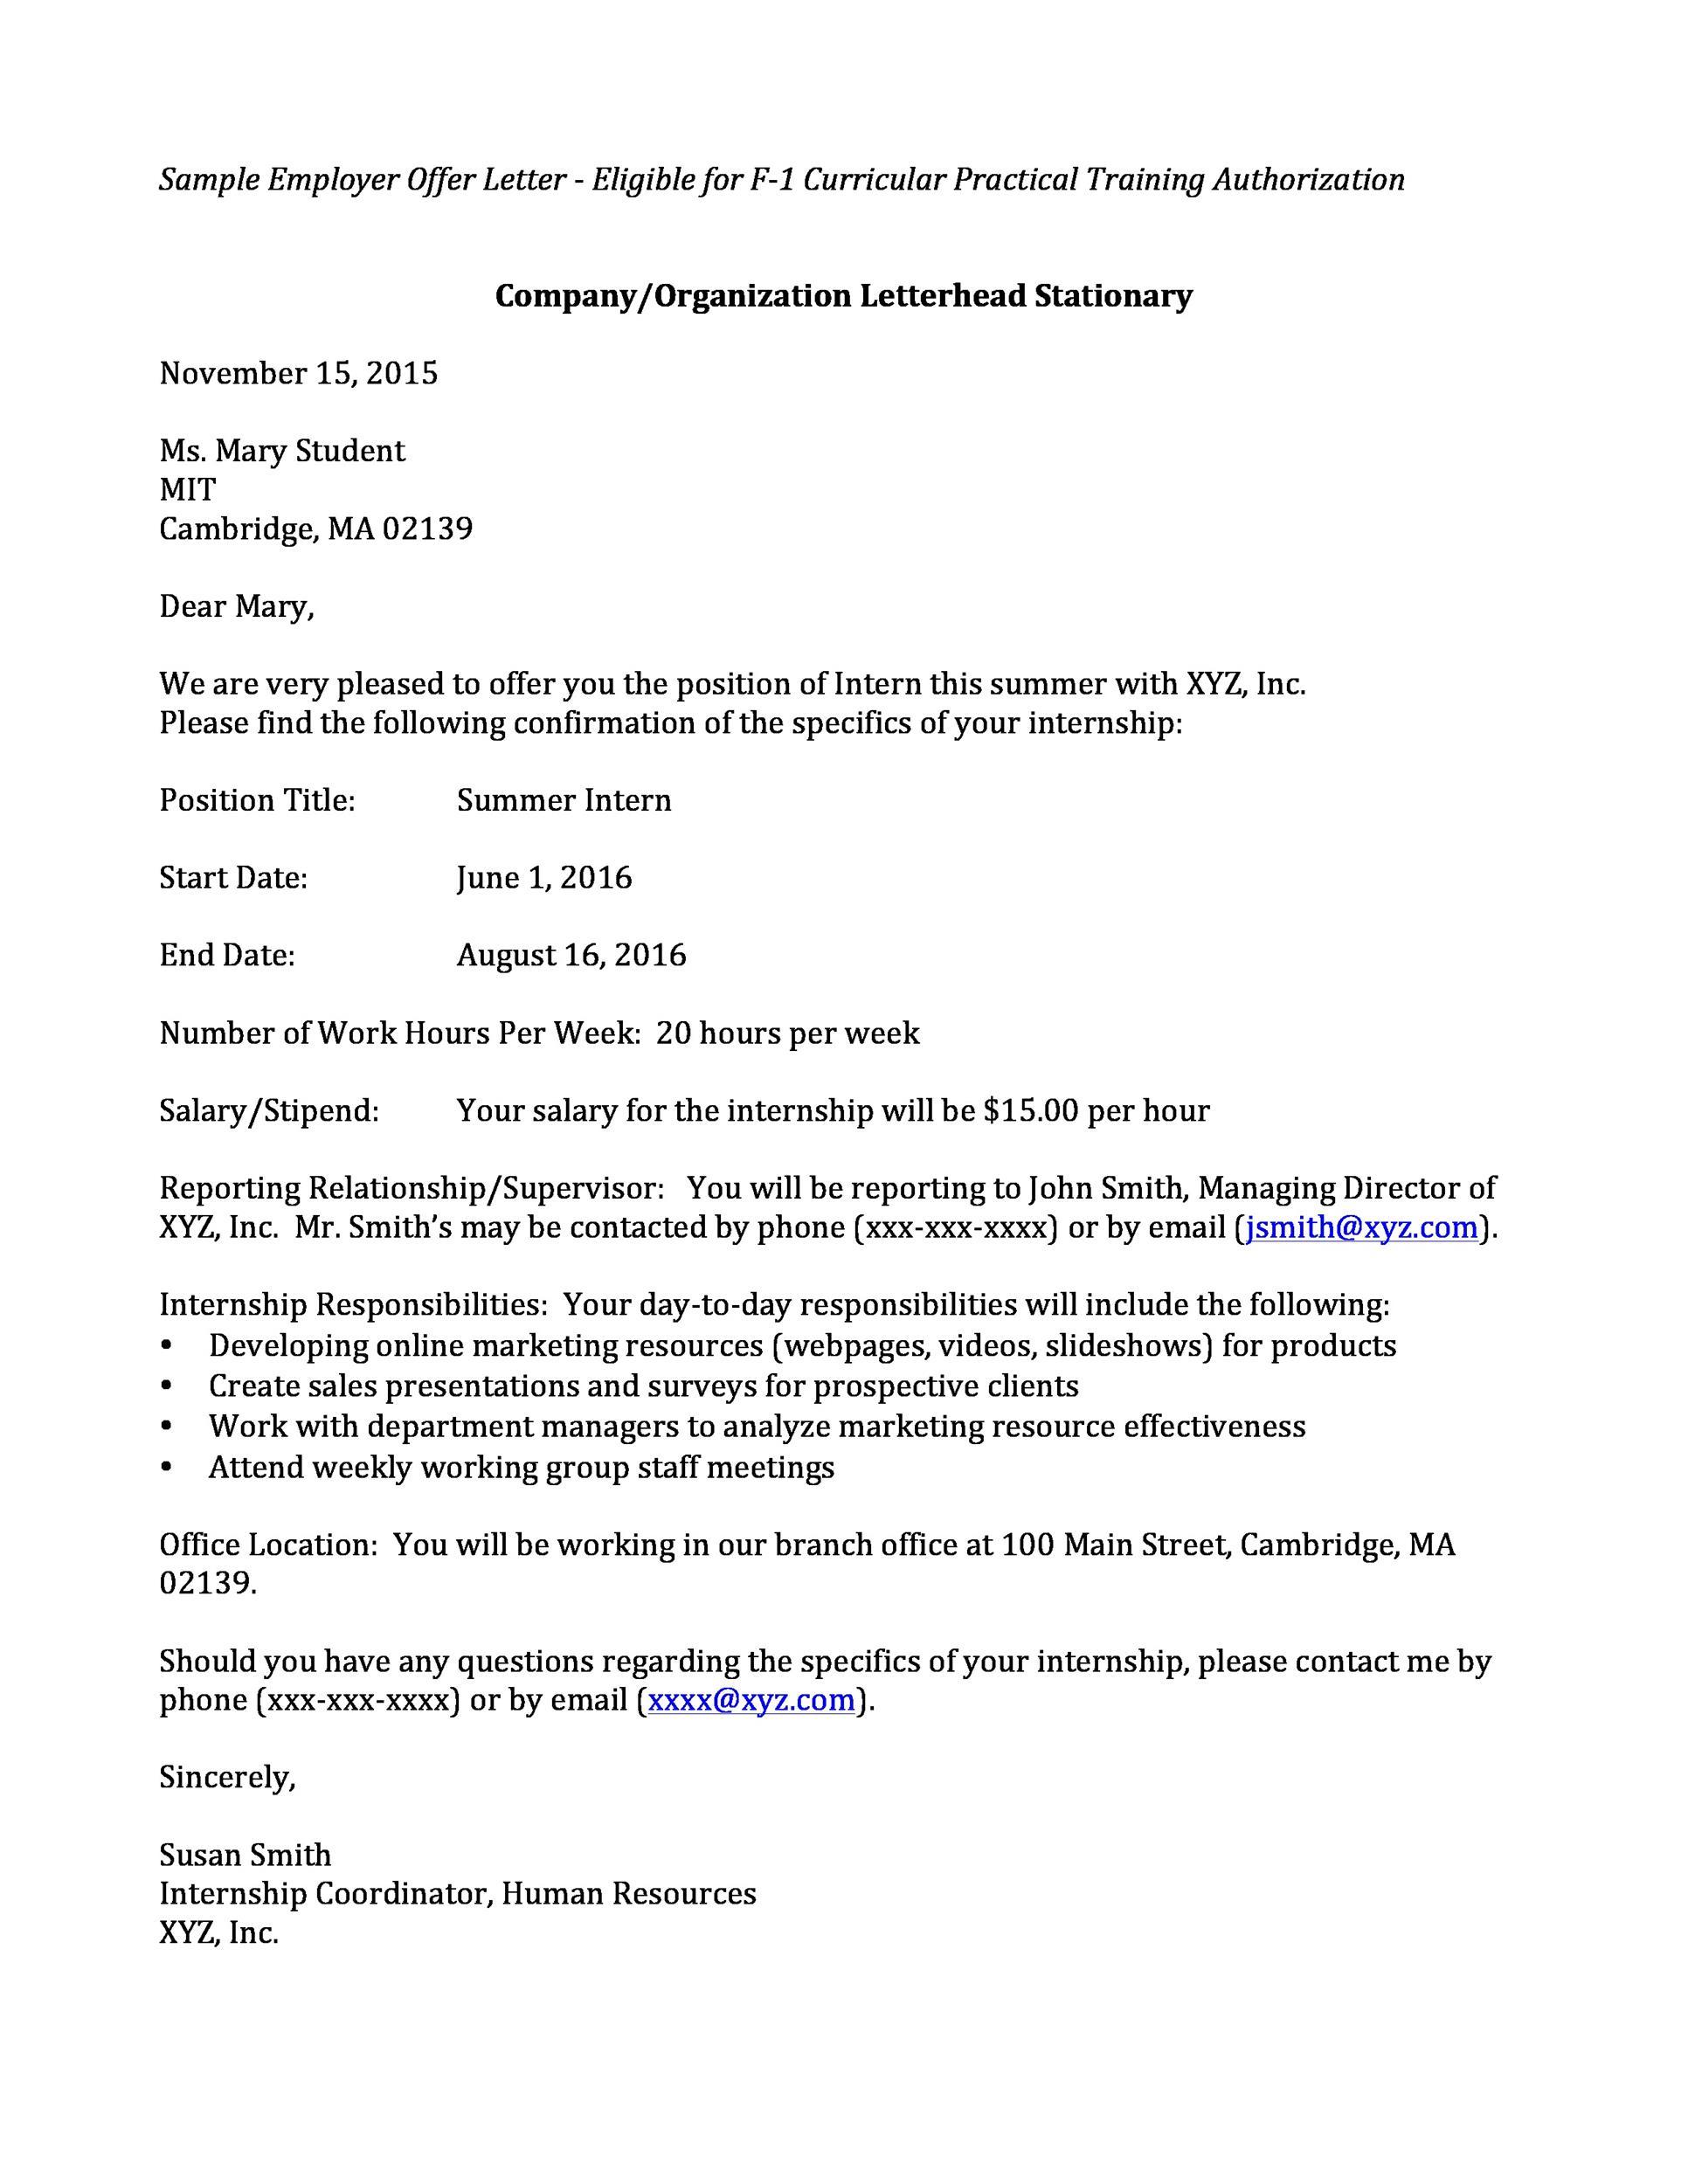 Sample Letter For Job Offer Negotiation Cover Letter Sample